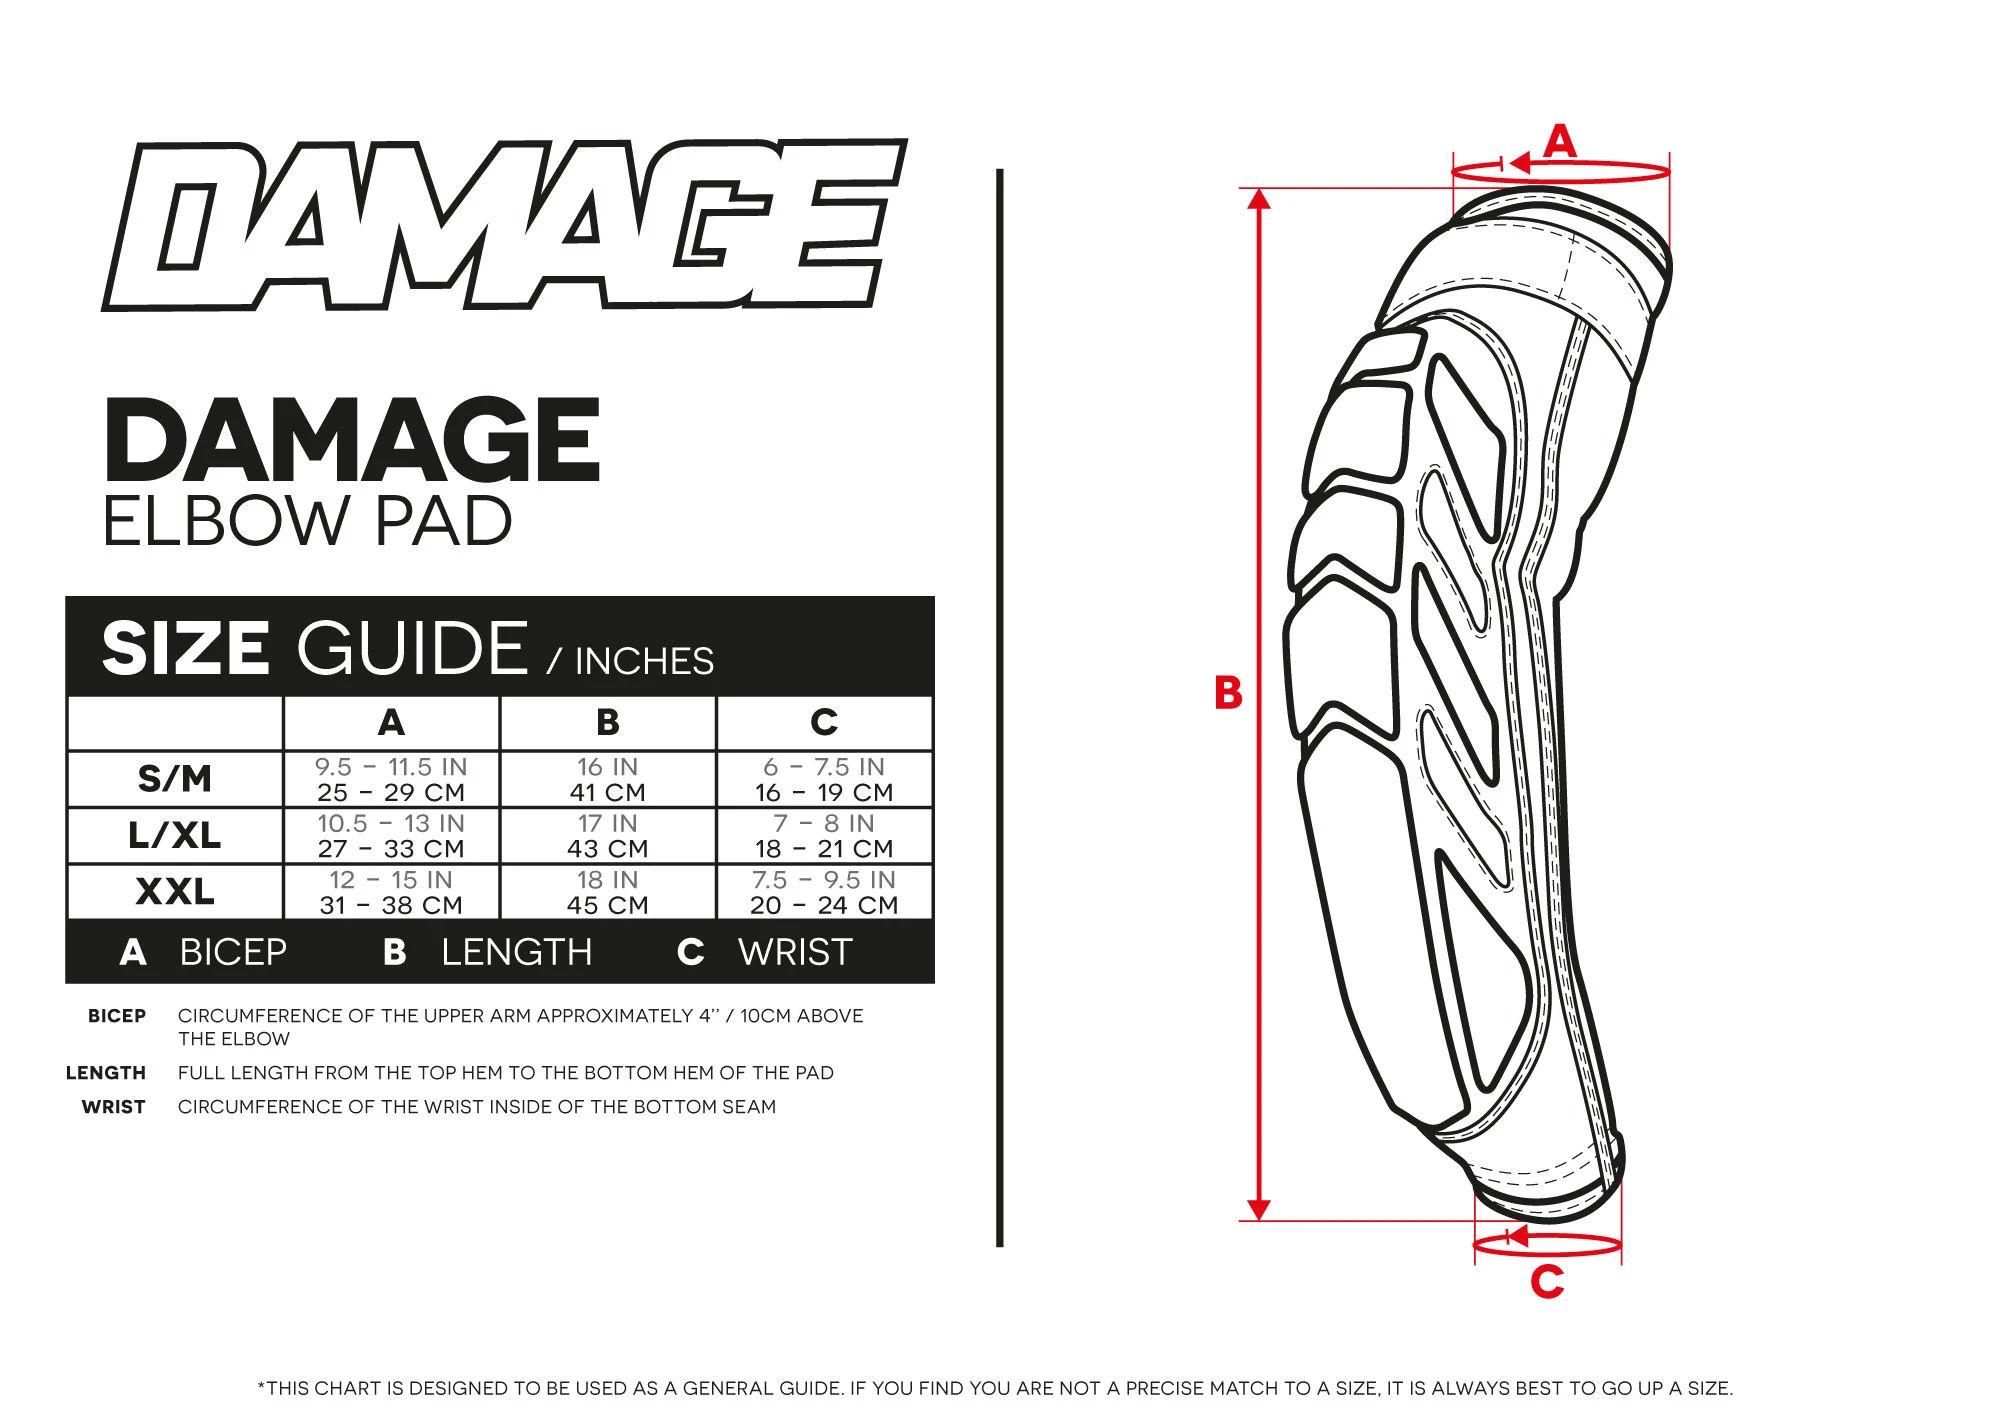 Damage Elbow Pad